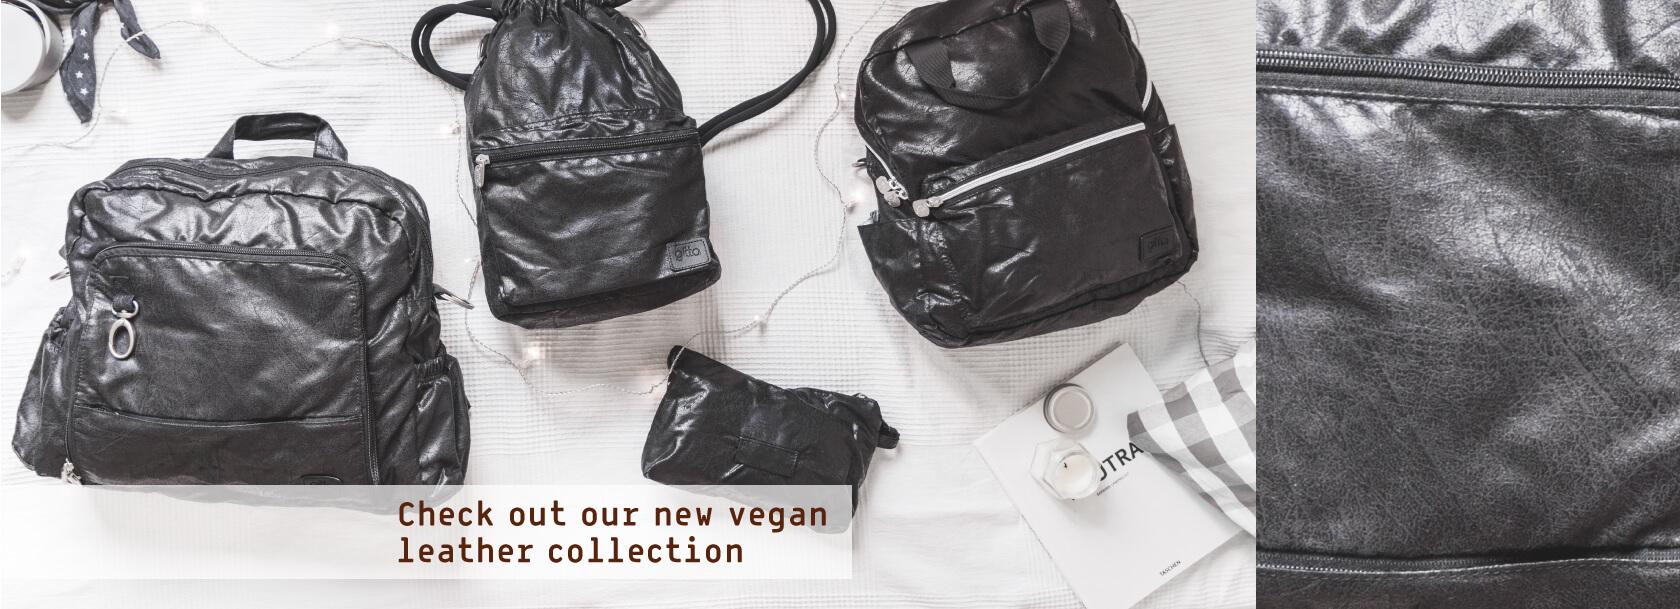 vegan-leather-comp